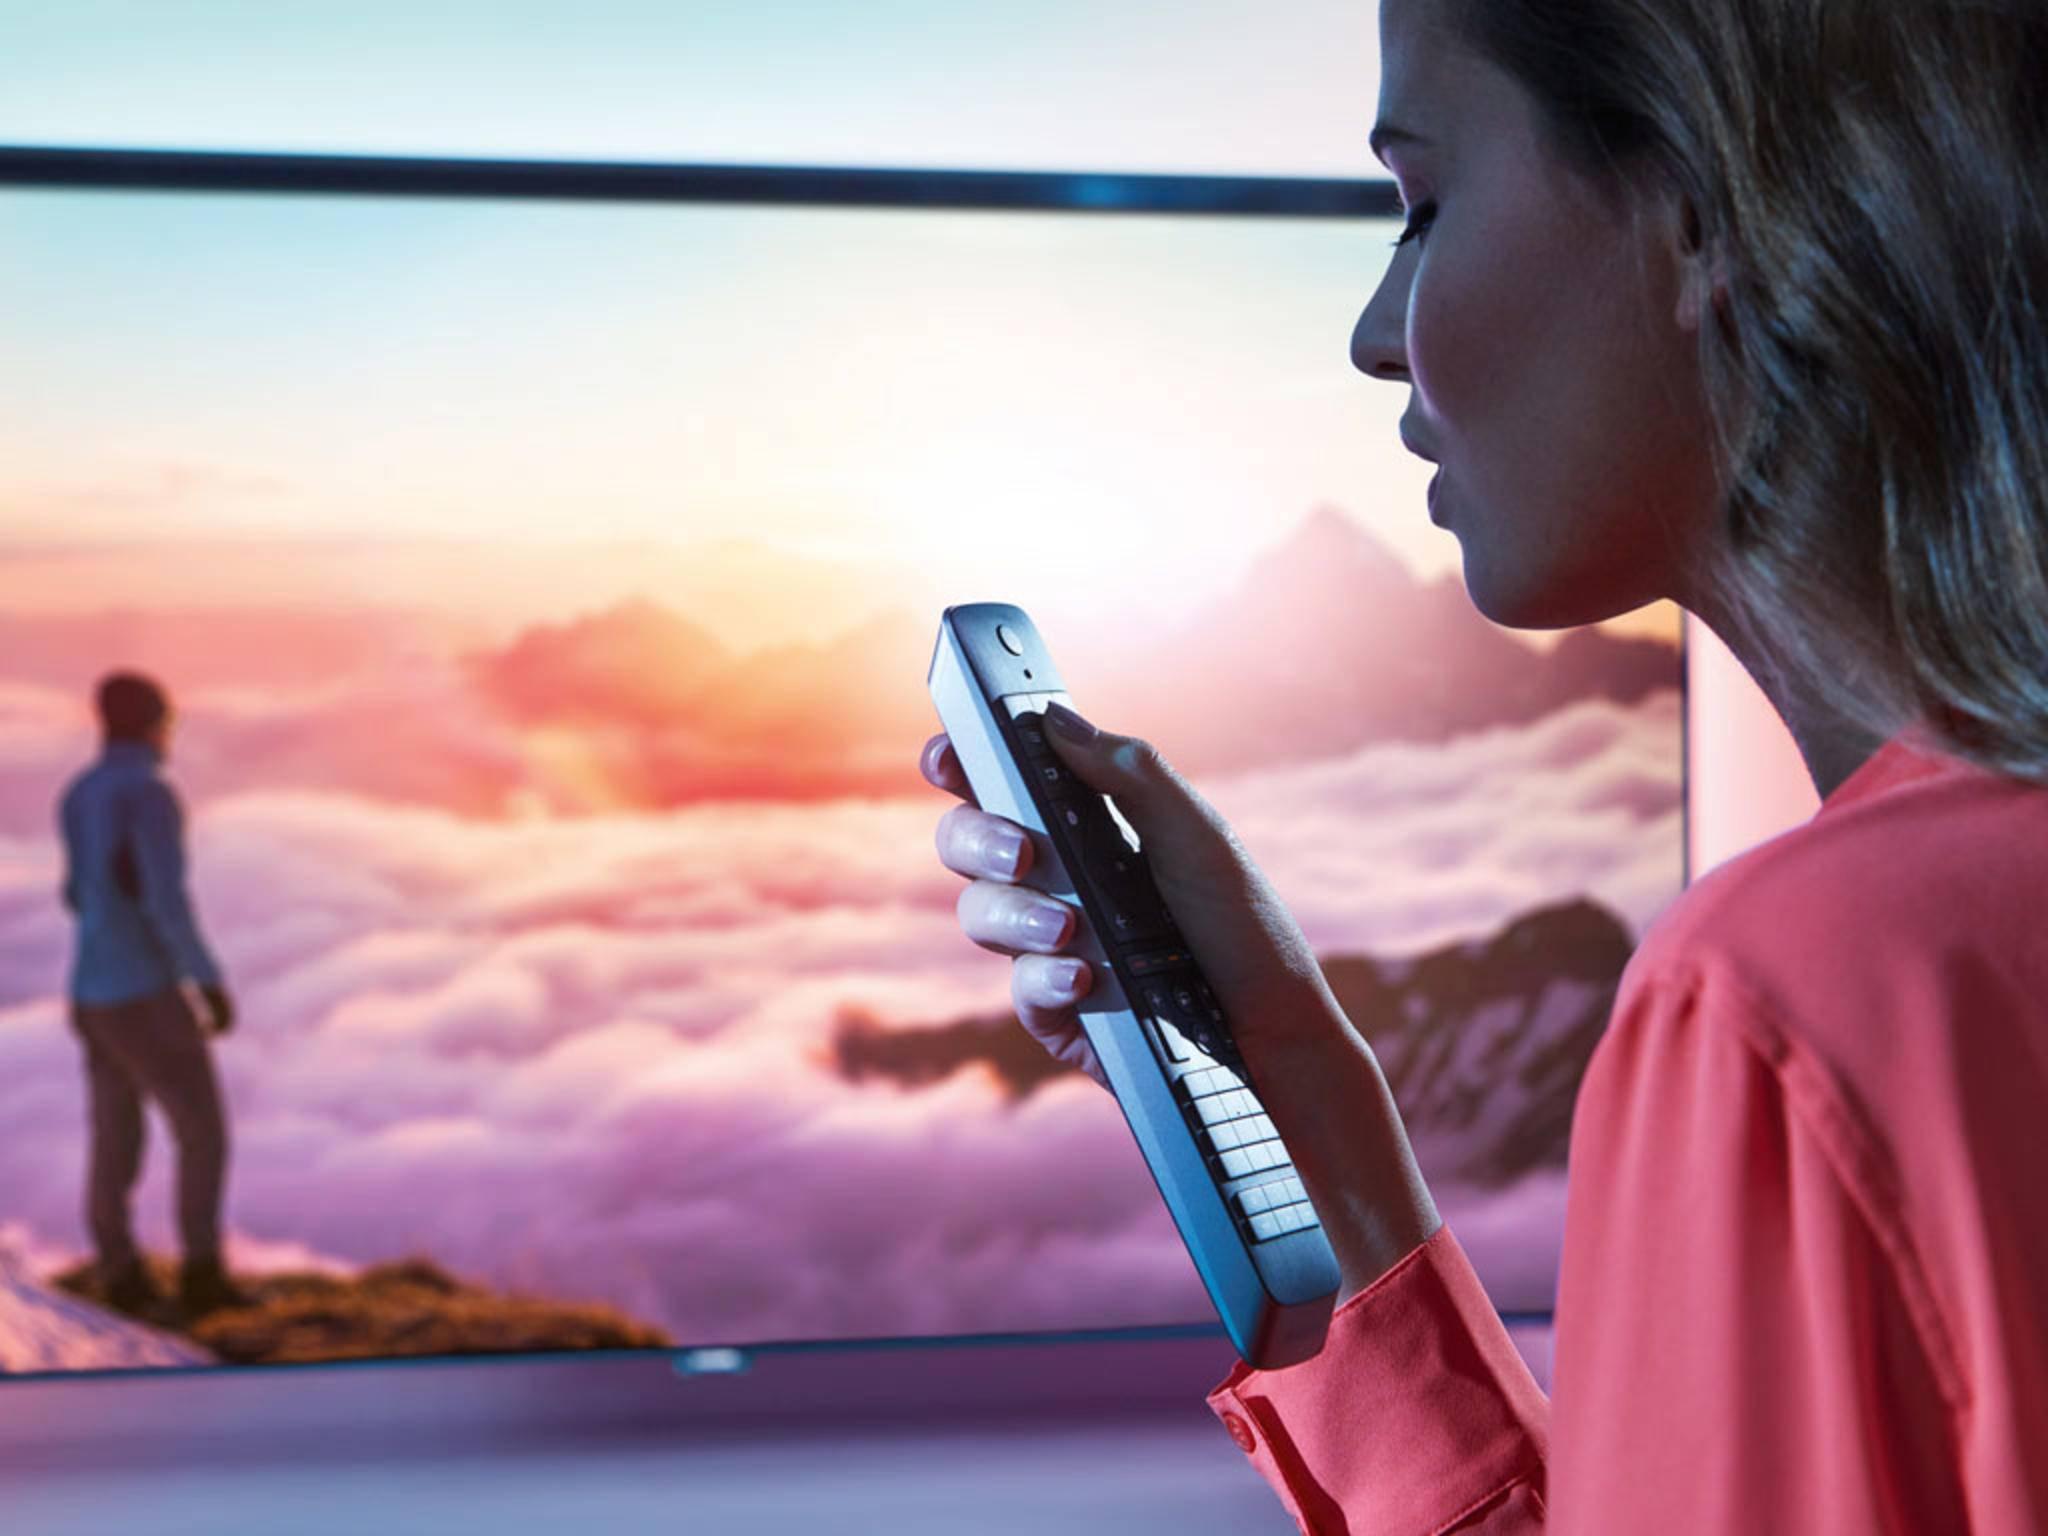 Ultrascharfes 4K-Bild – HDMI 2.0 macht's möglich.